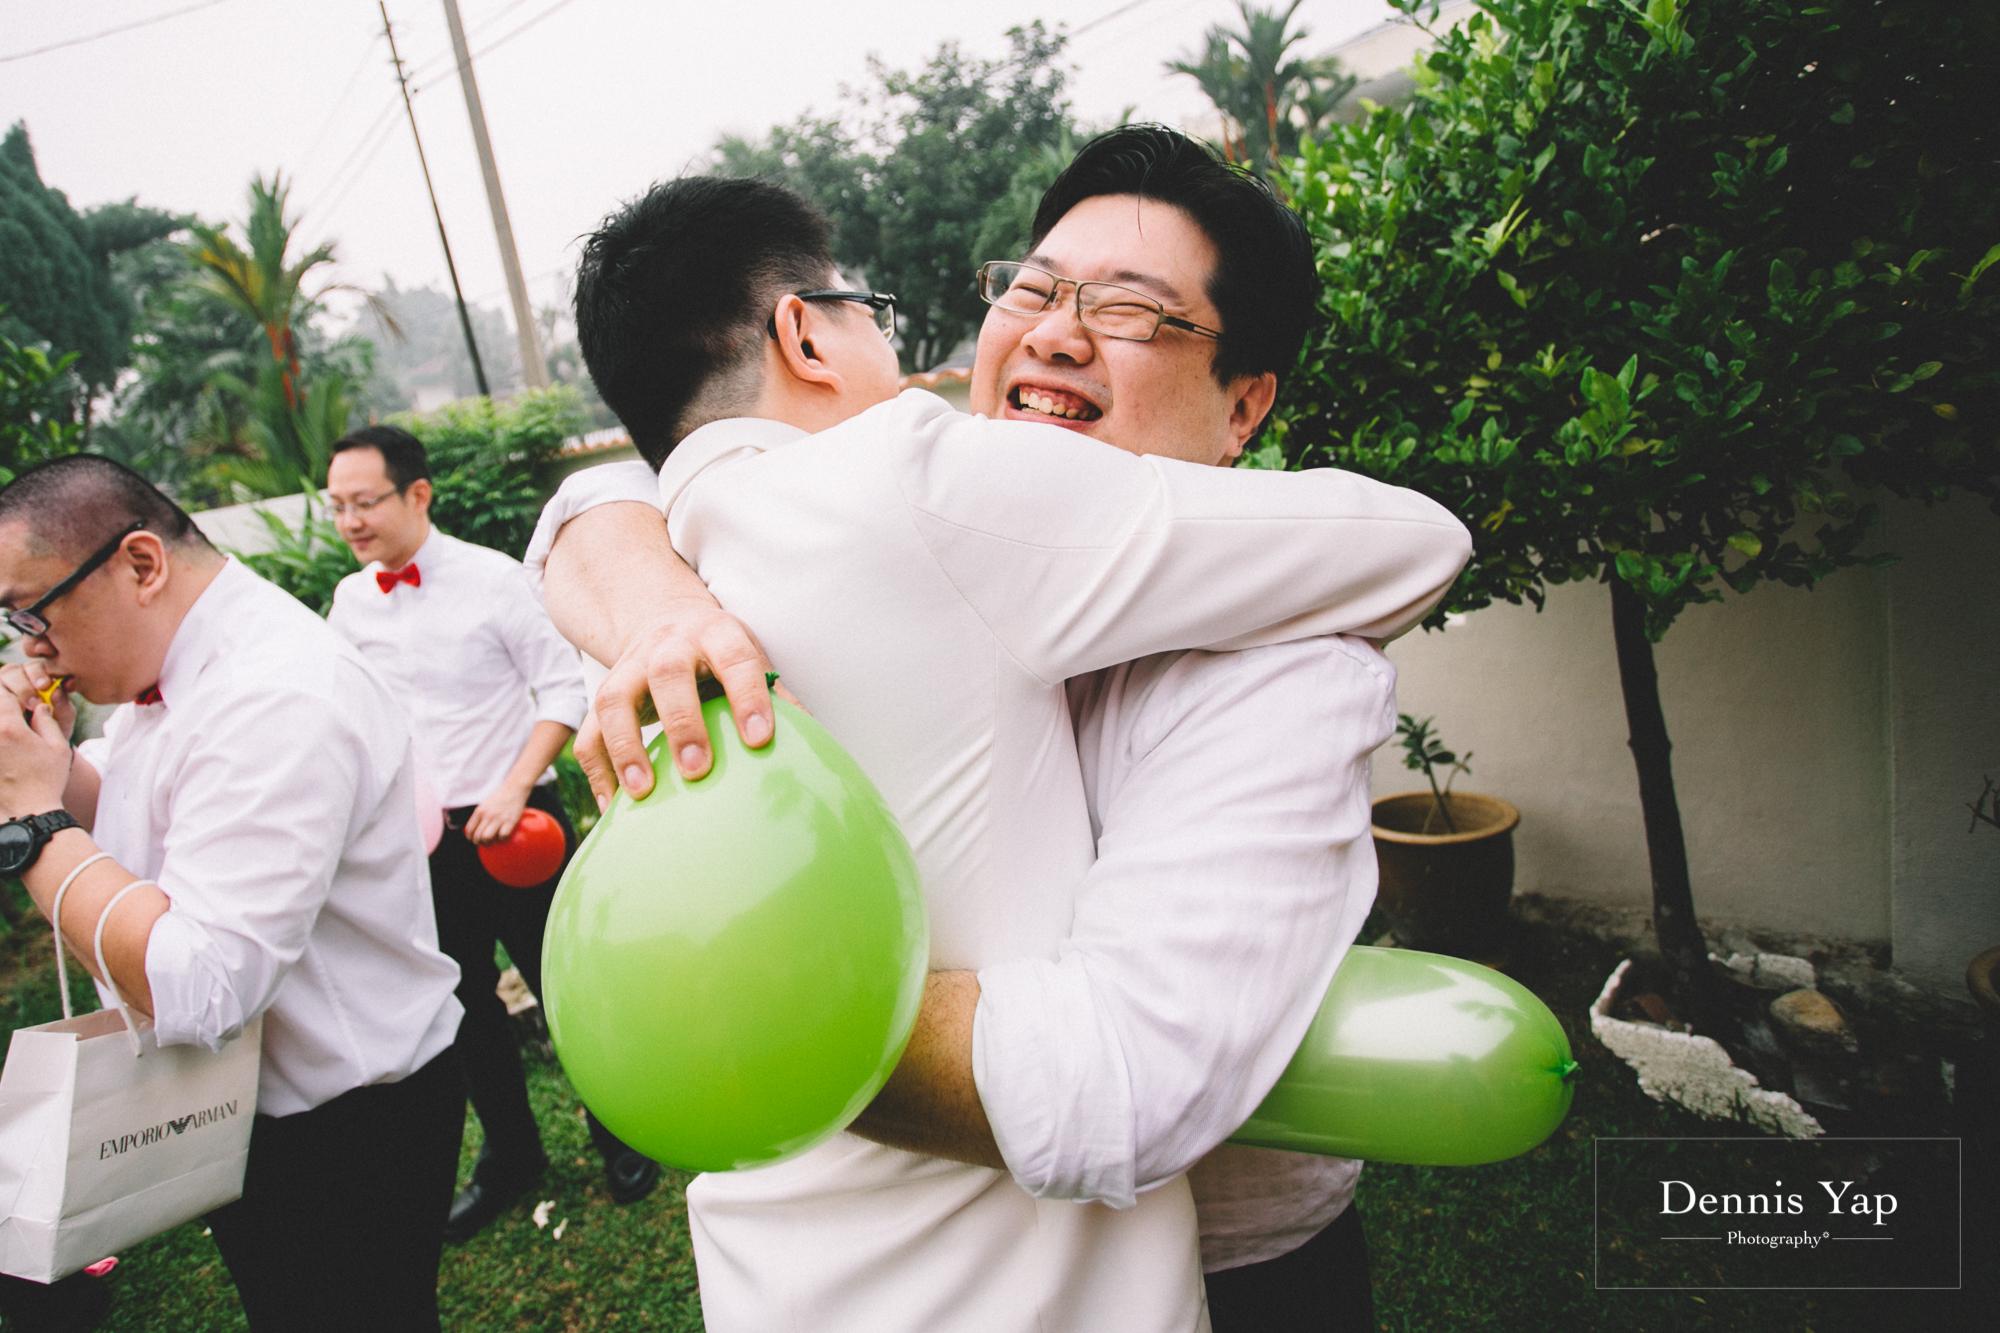 alex shir ley wedding day gate crash subang jaya usj dennis yap photography moments-6.jpg